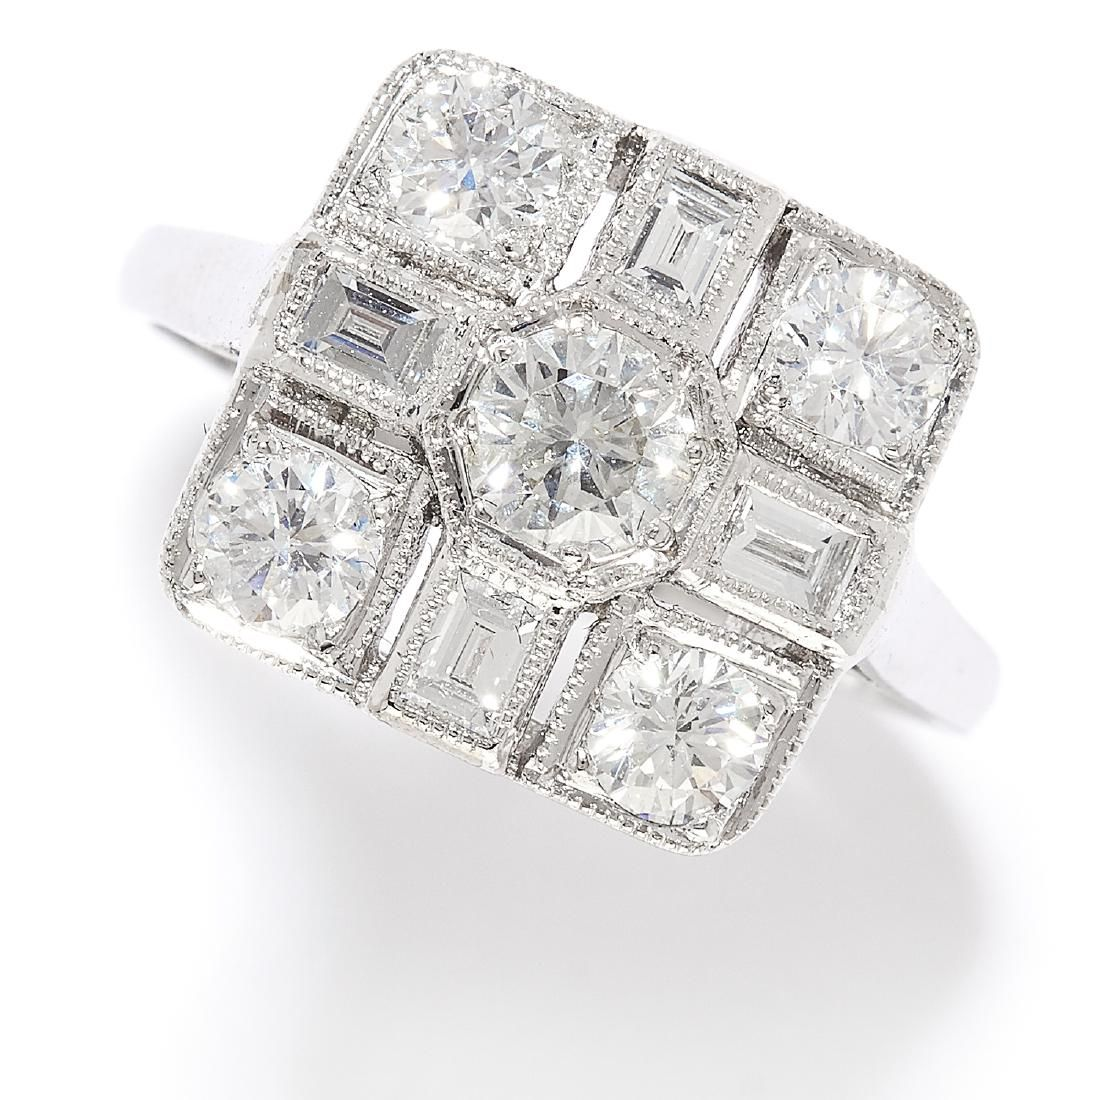 1.35 CARAT DIAMOND RING in 18ct white gold, in Art Deco